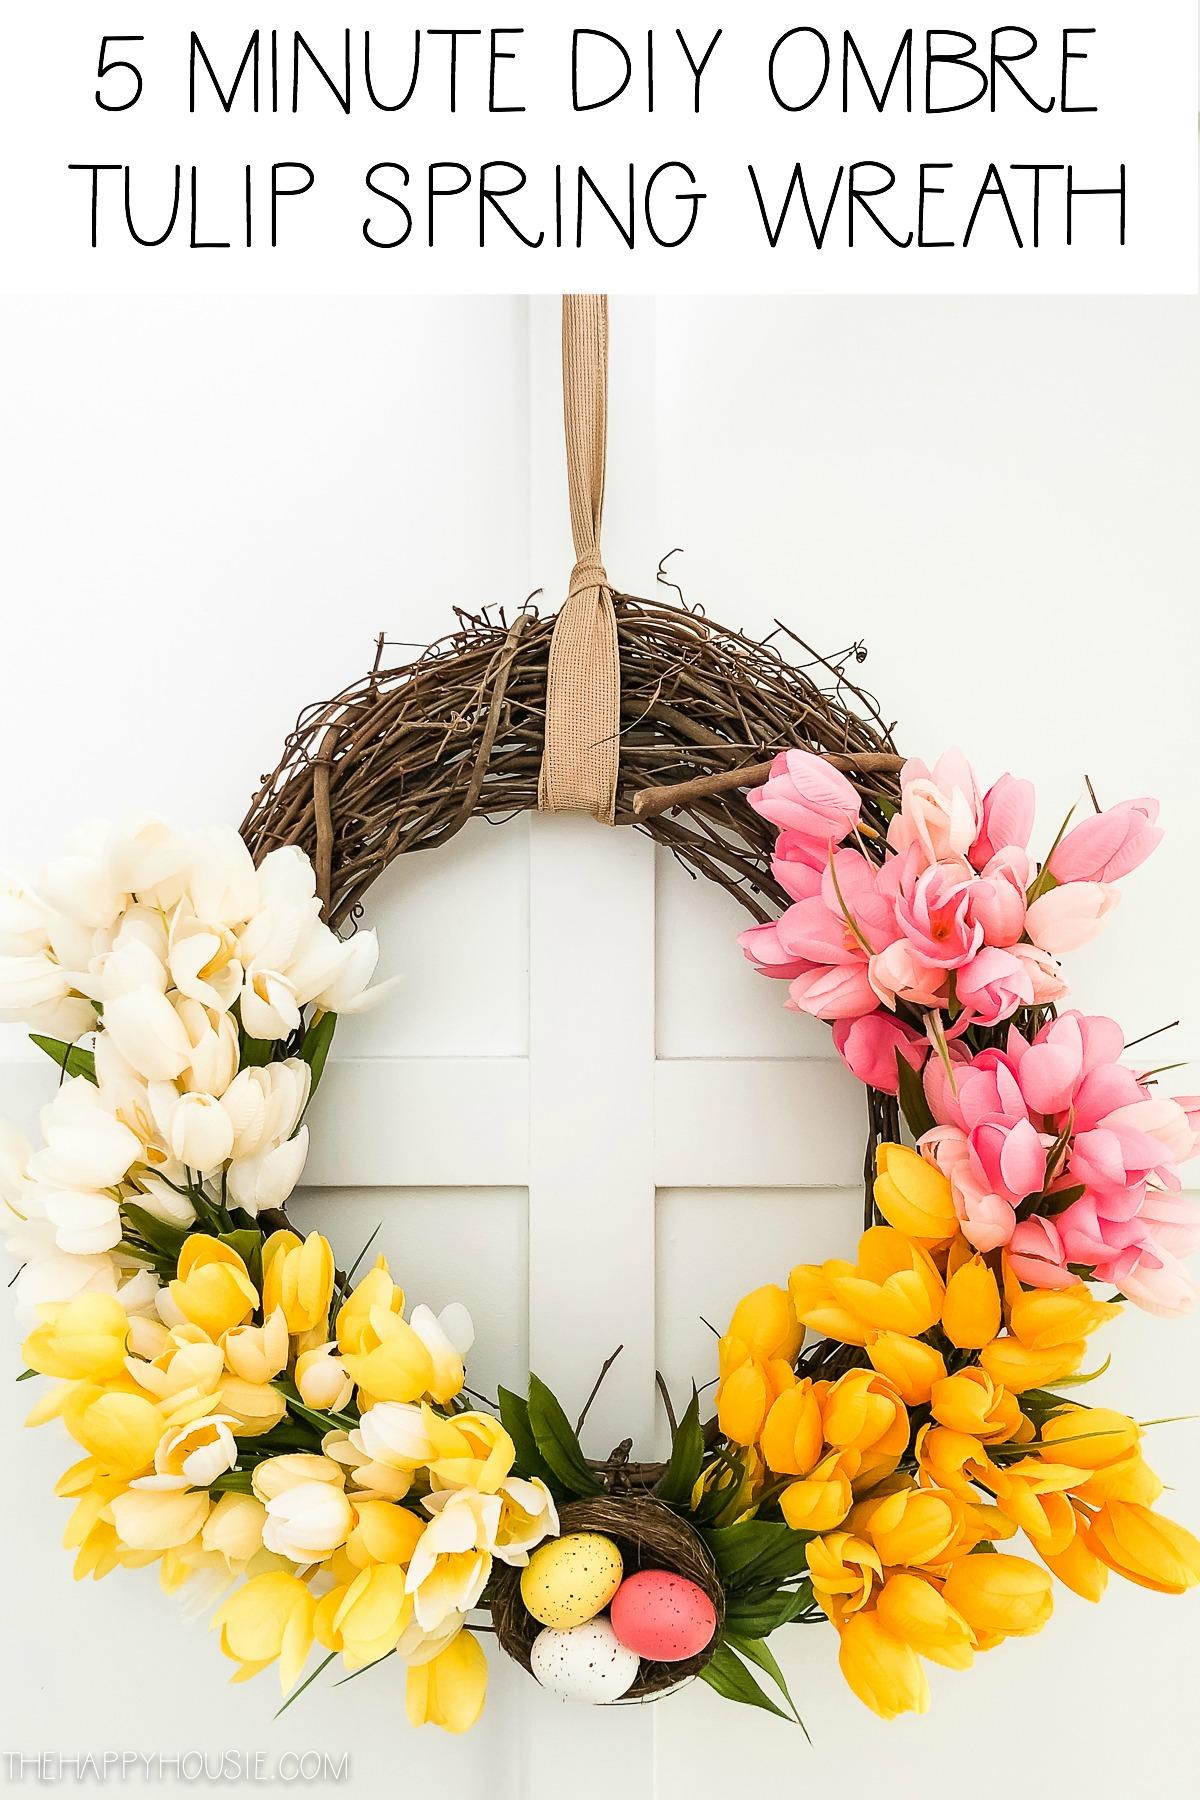 5 Minute DIY Ombre Tulip Spring Wreath graphic.